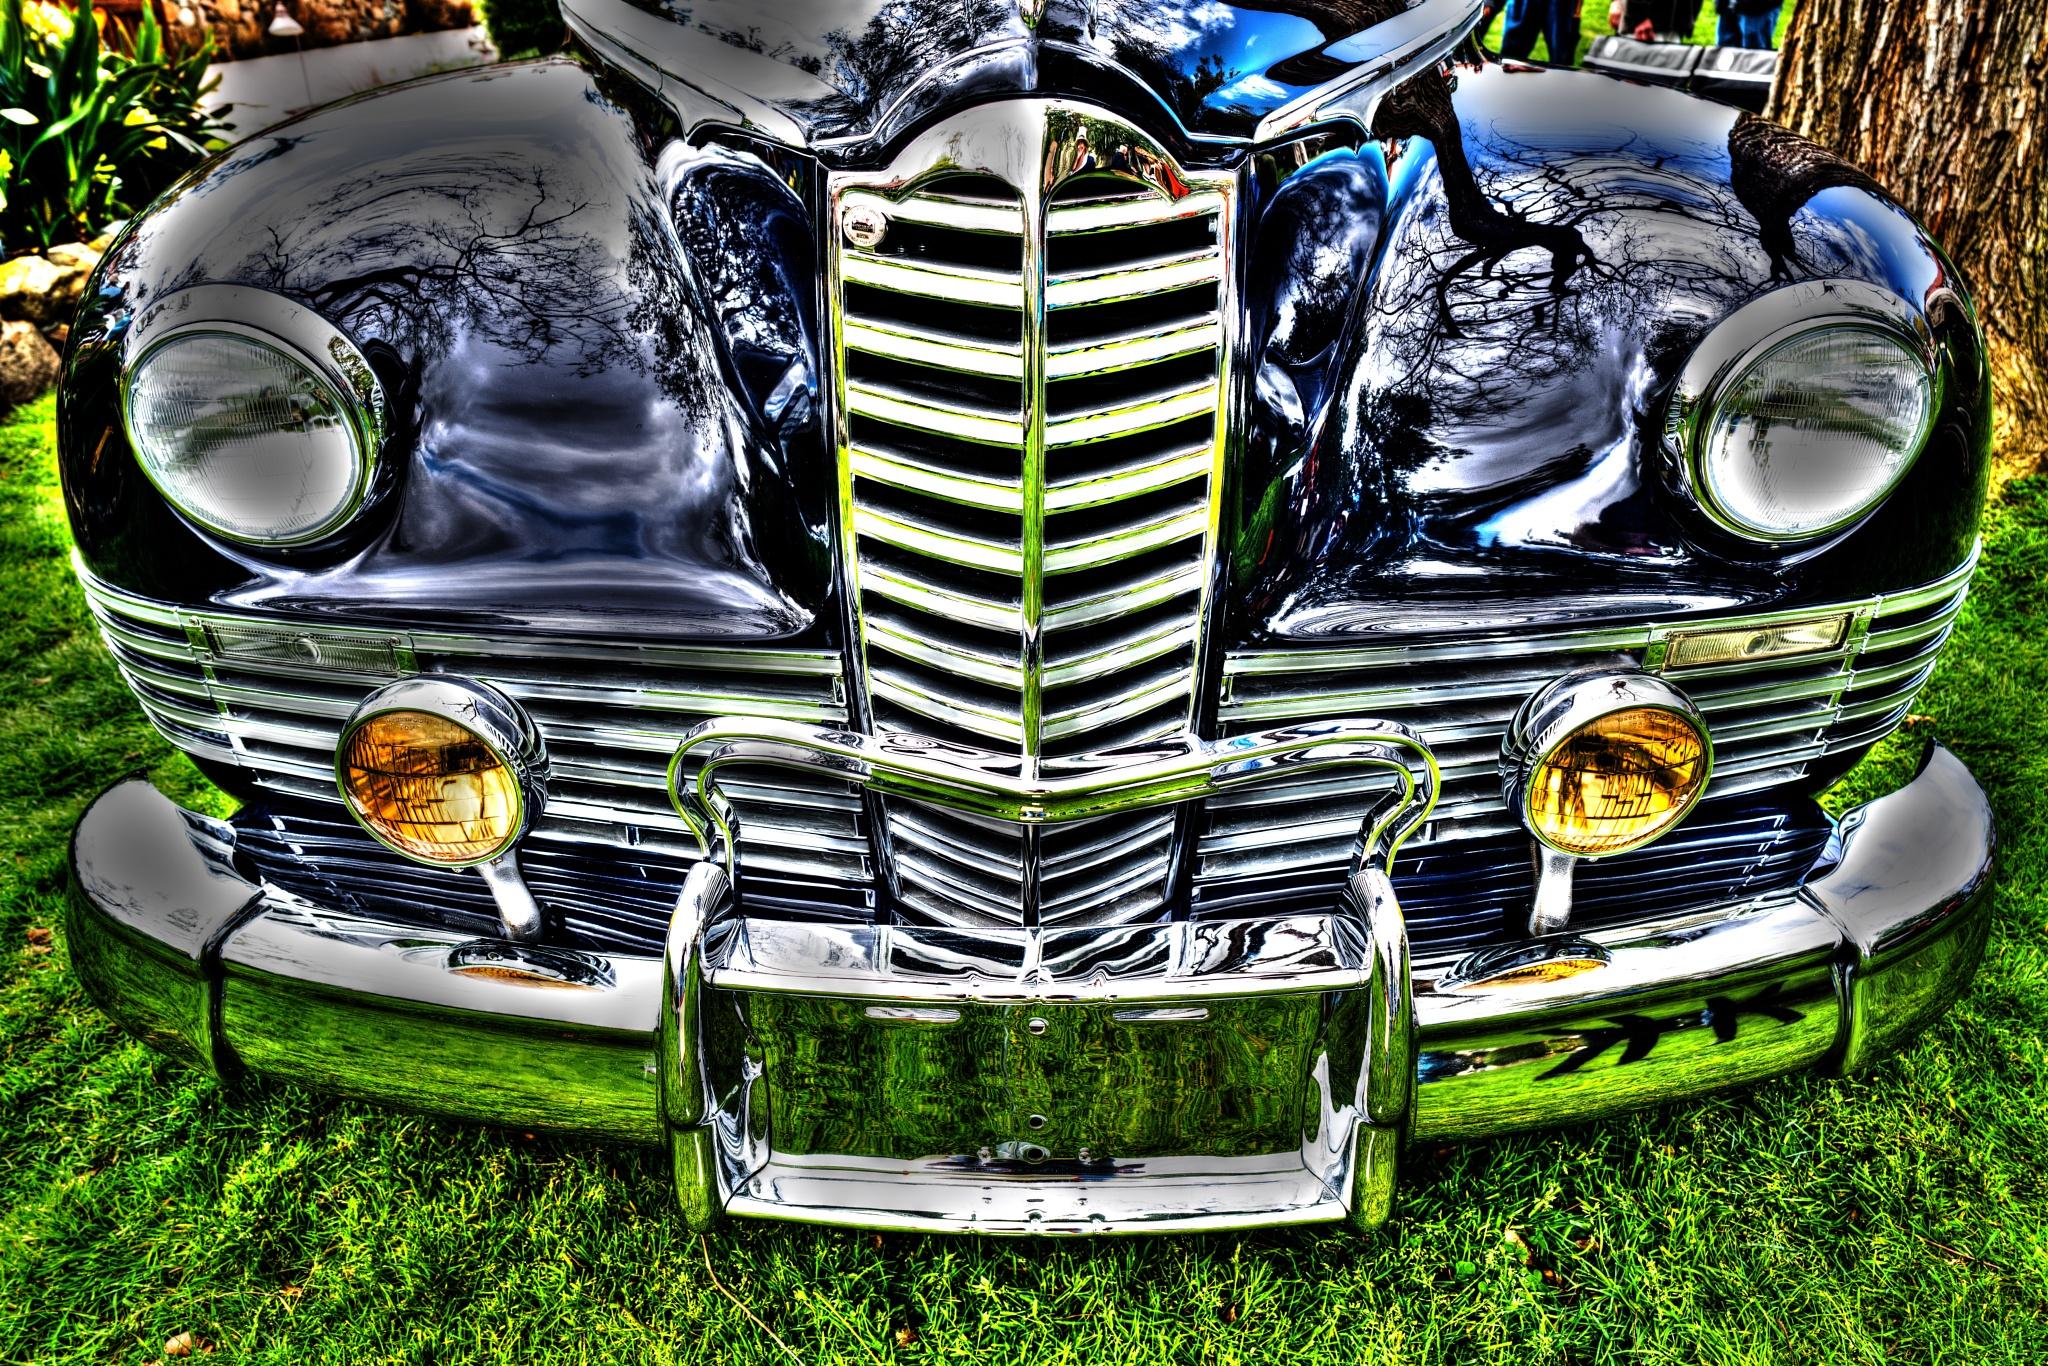 Classic Car by John Weigel